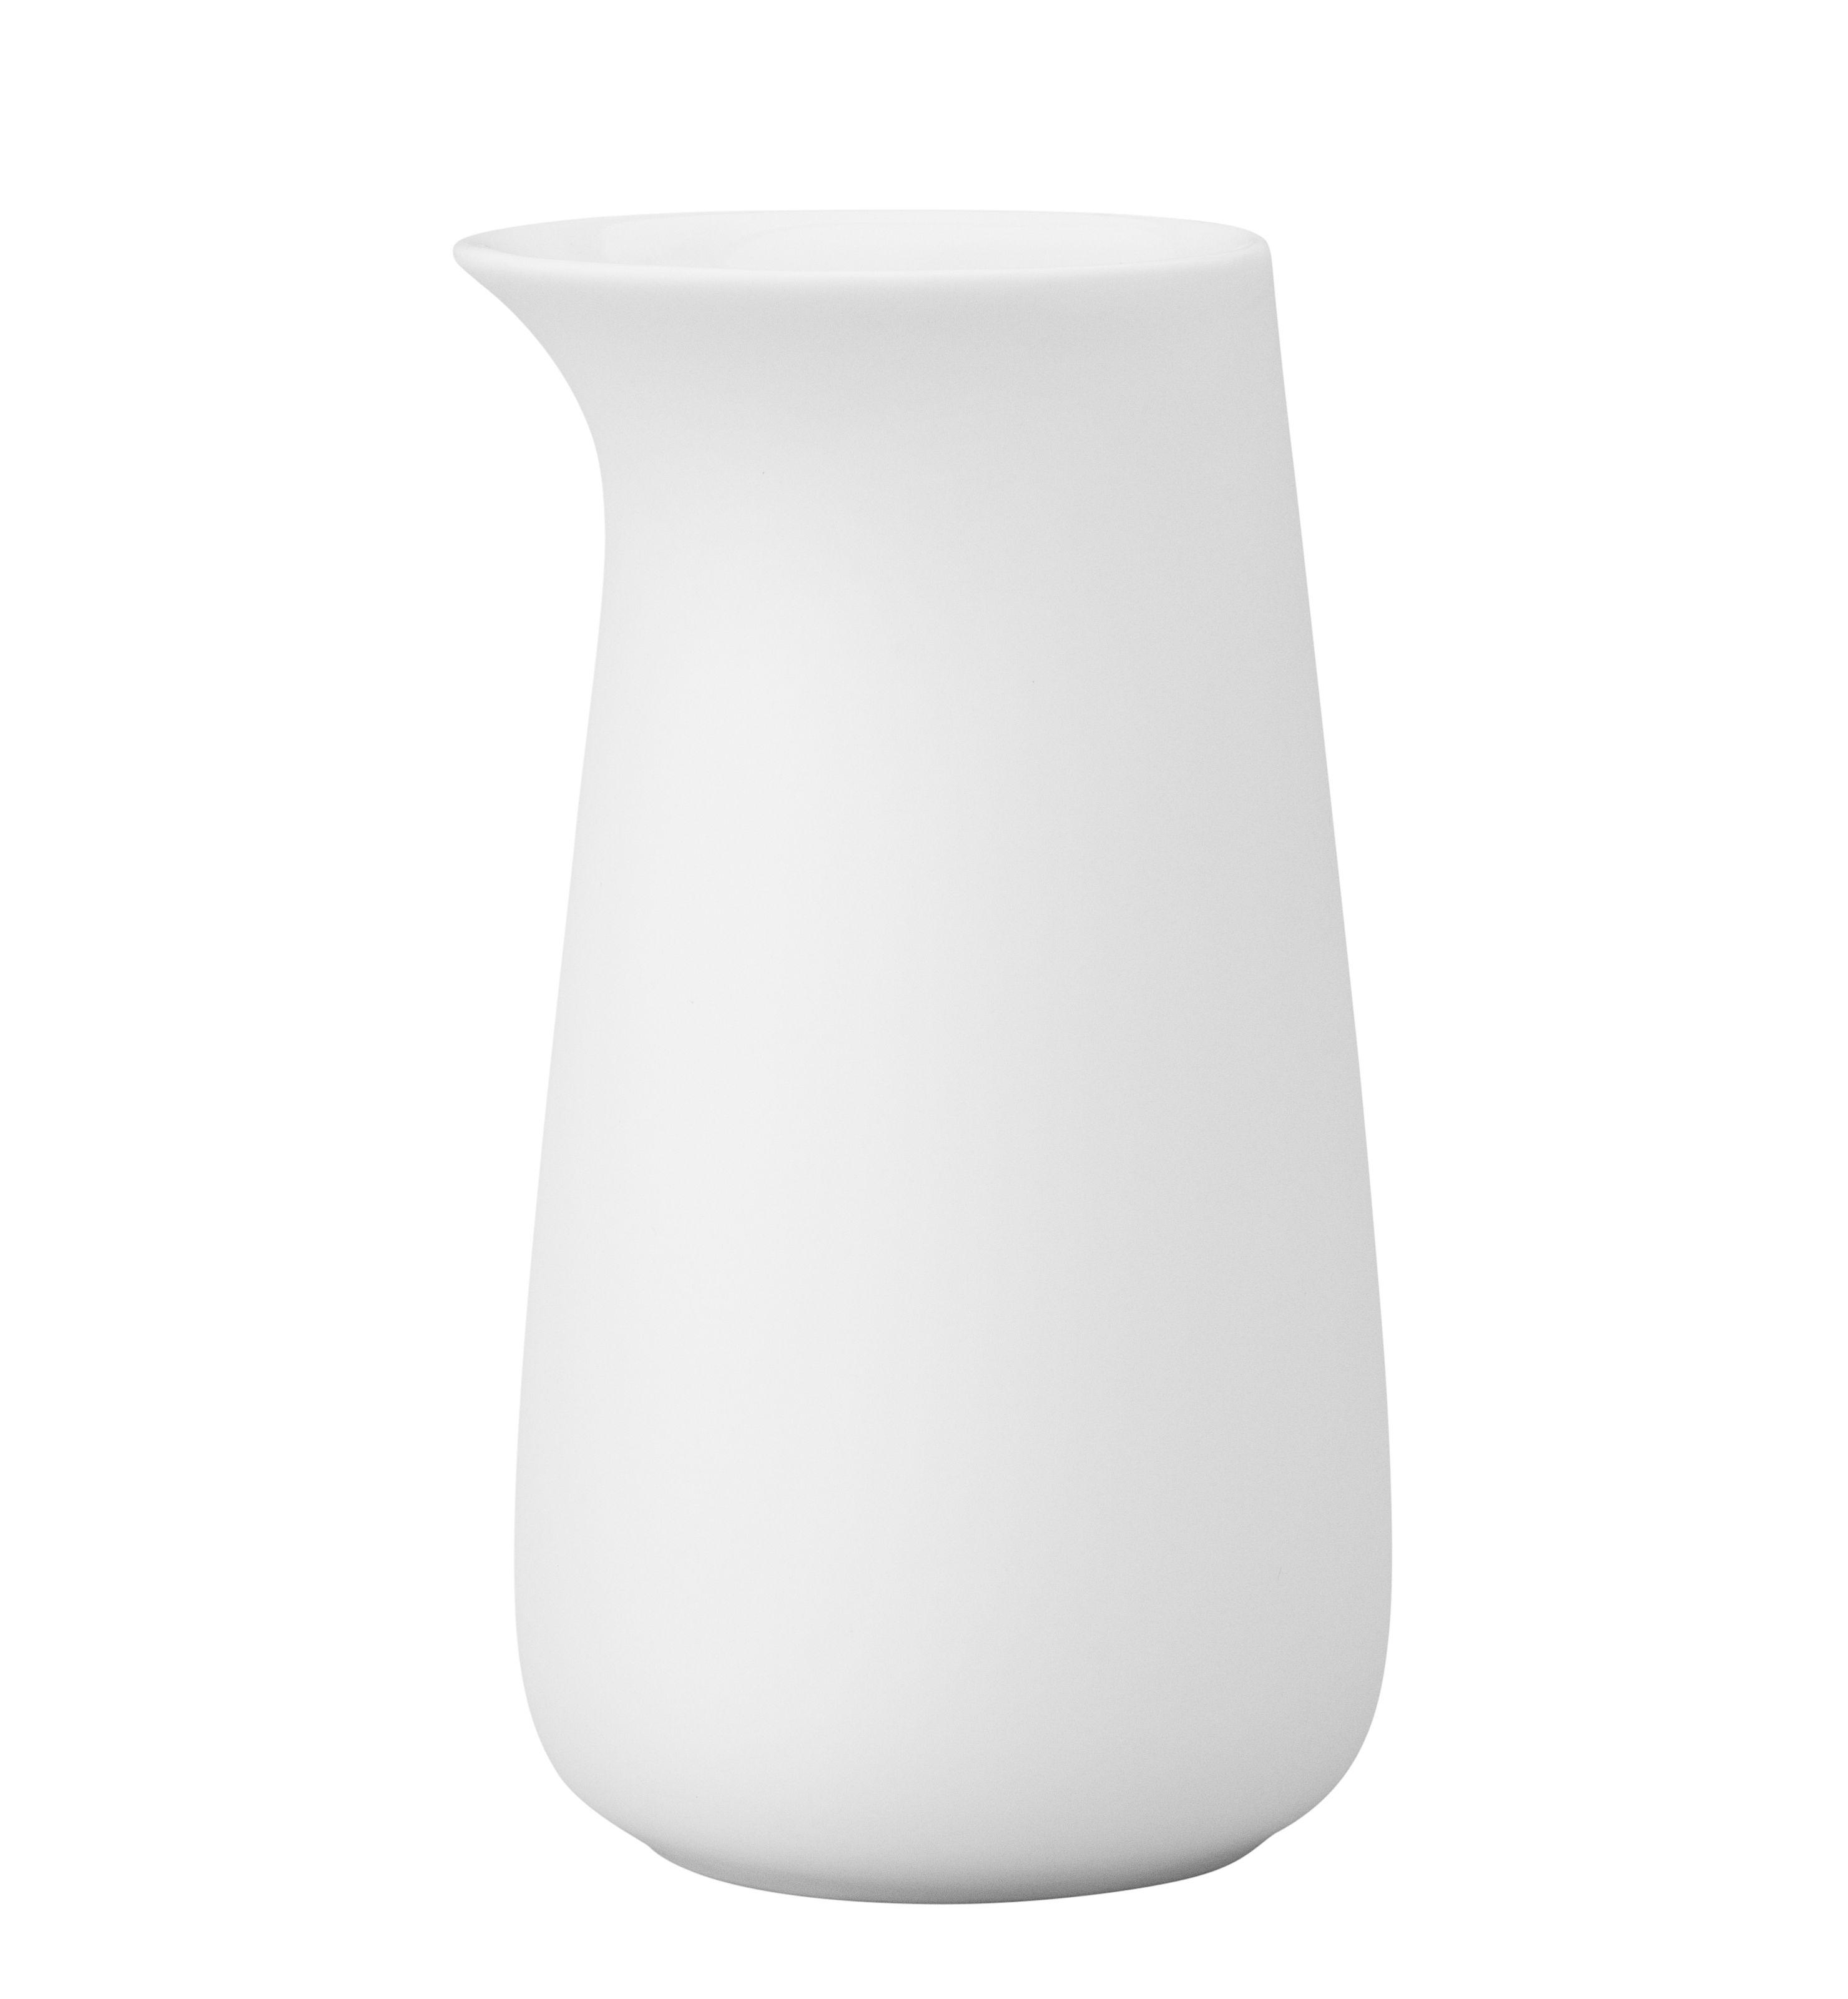 Tableware - Tea & Coffee Accessories - Foster Milk pot - / Stoneware - 0.5 L by Stelton - White - China